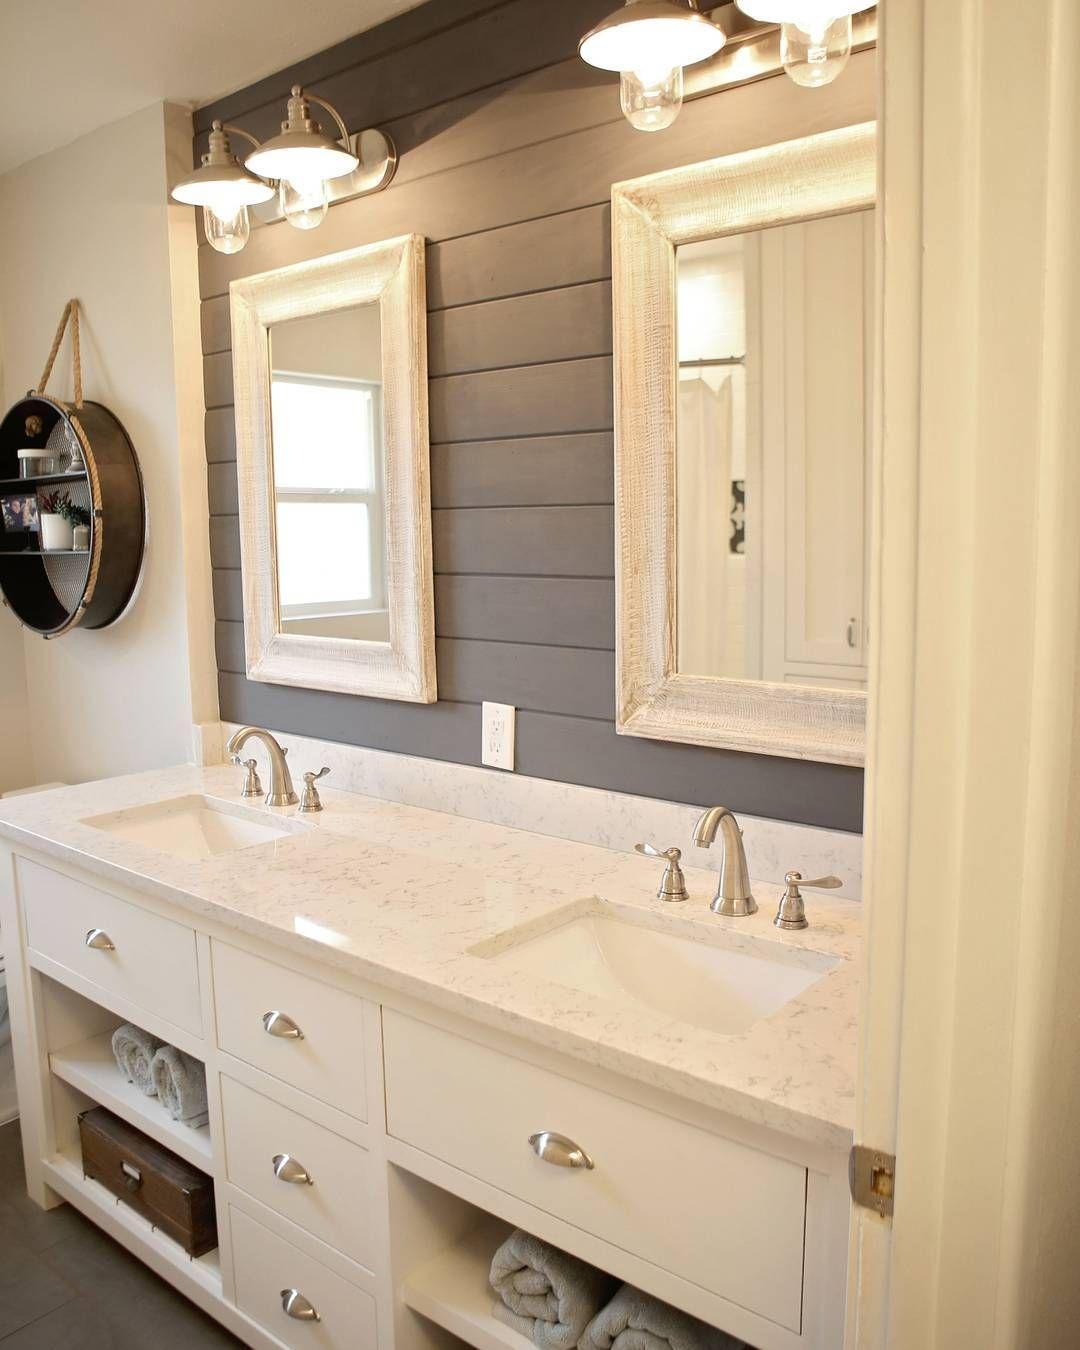 Shiplap Bathroom Vanity: @itsmemeags' Bathroom Has Us OBSESSED With Shiplap